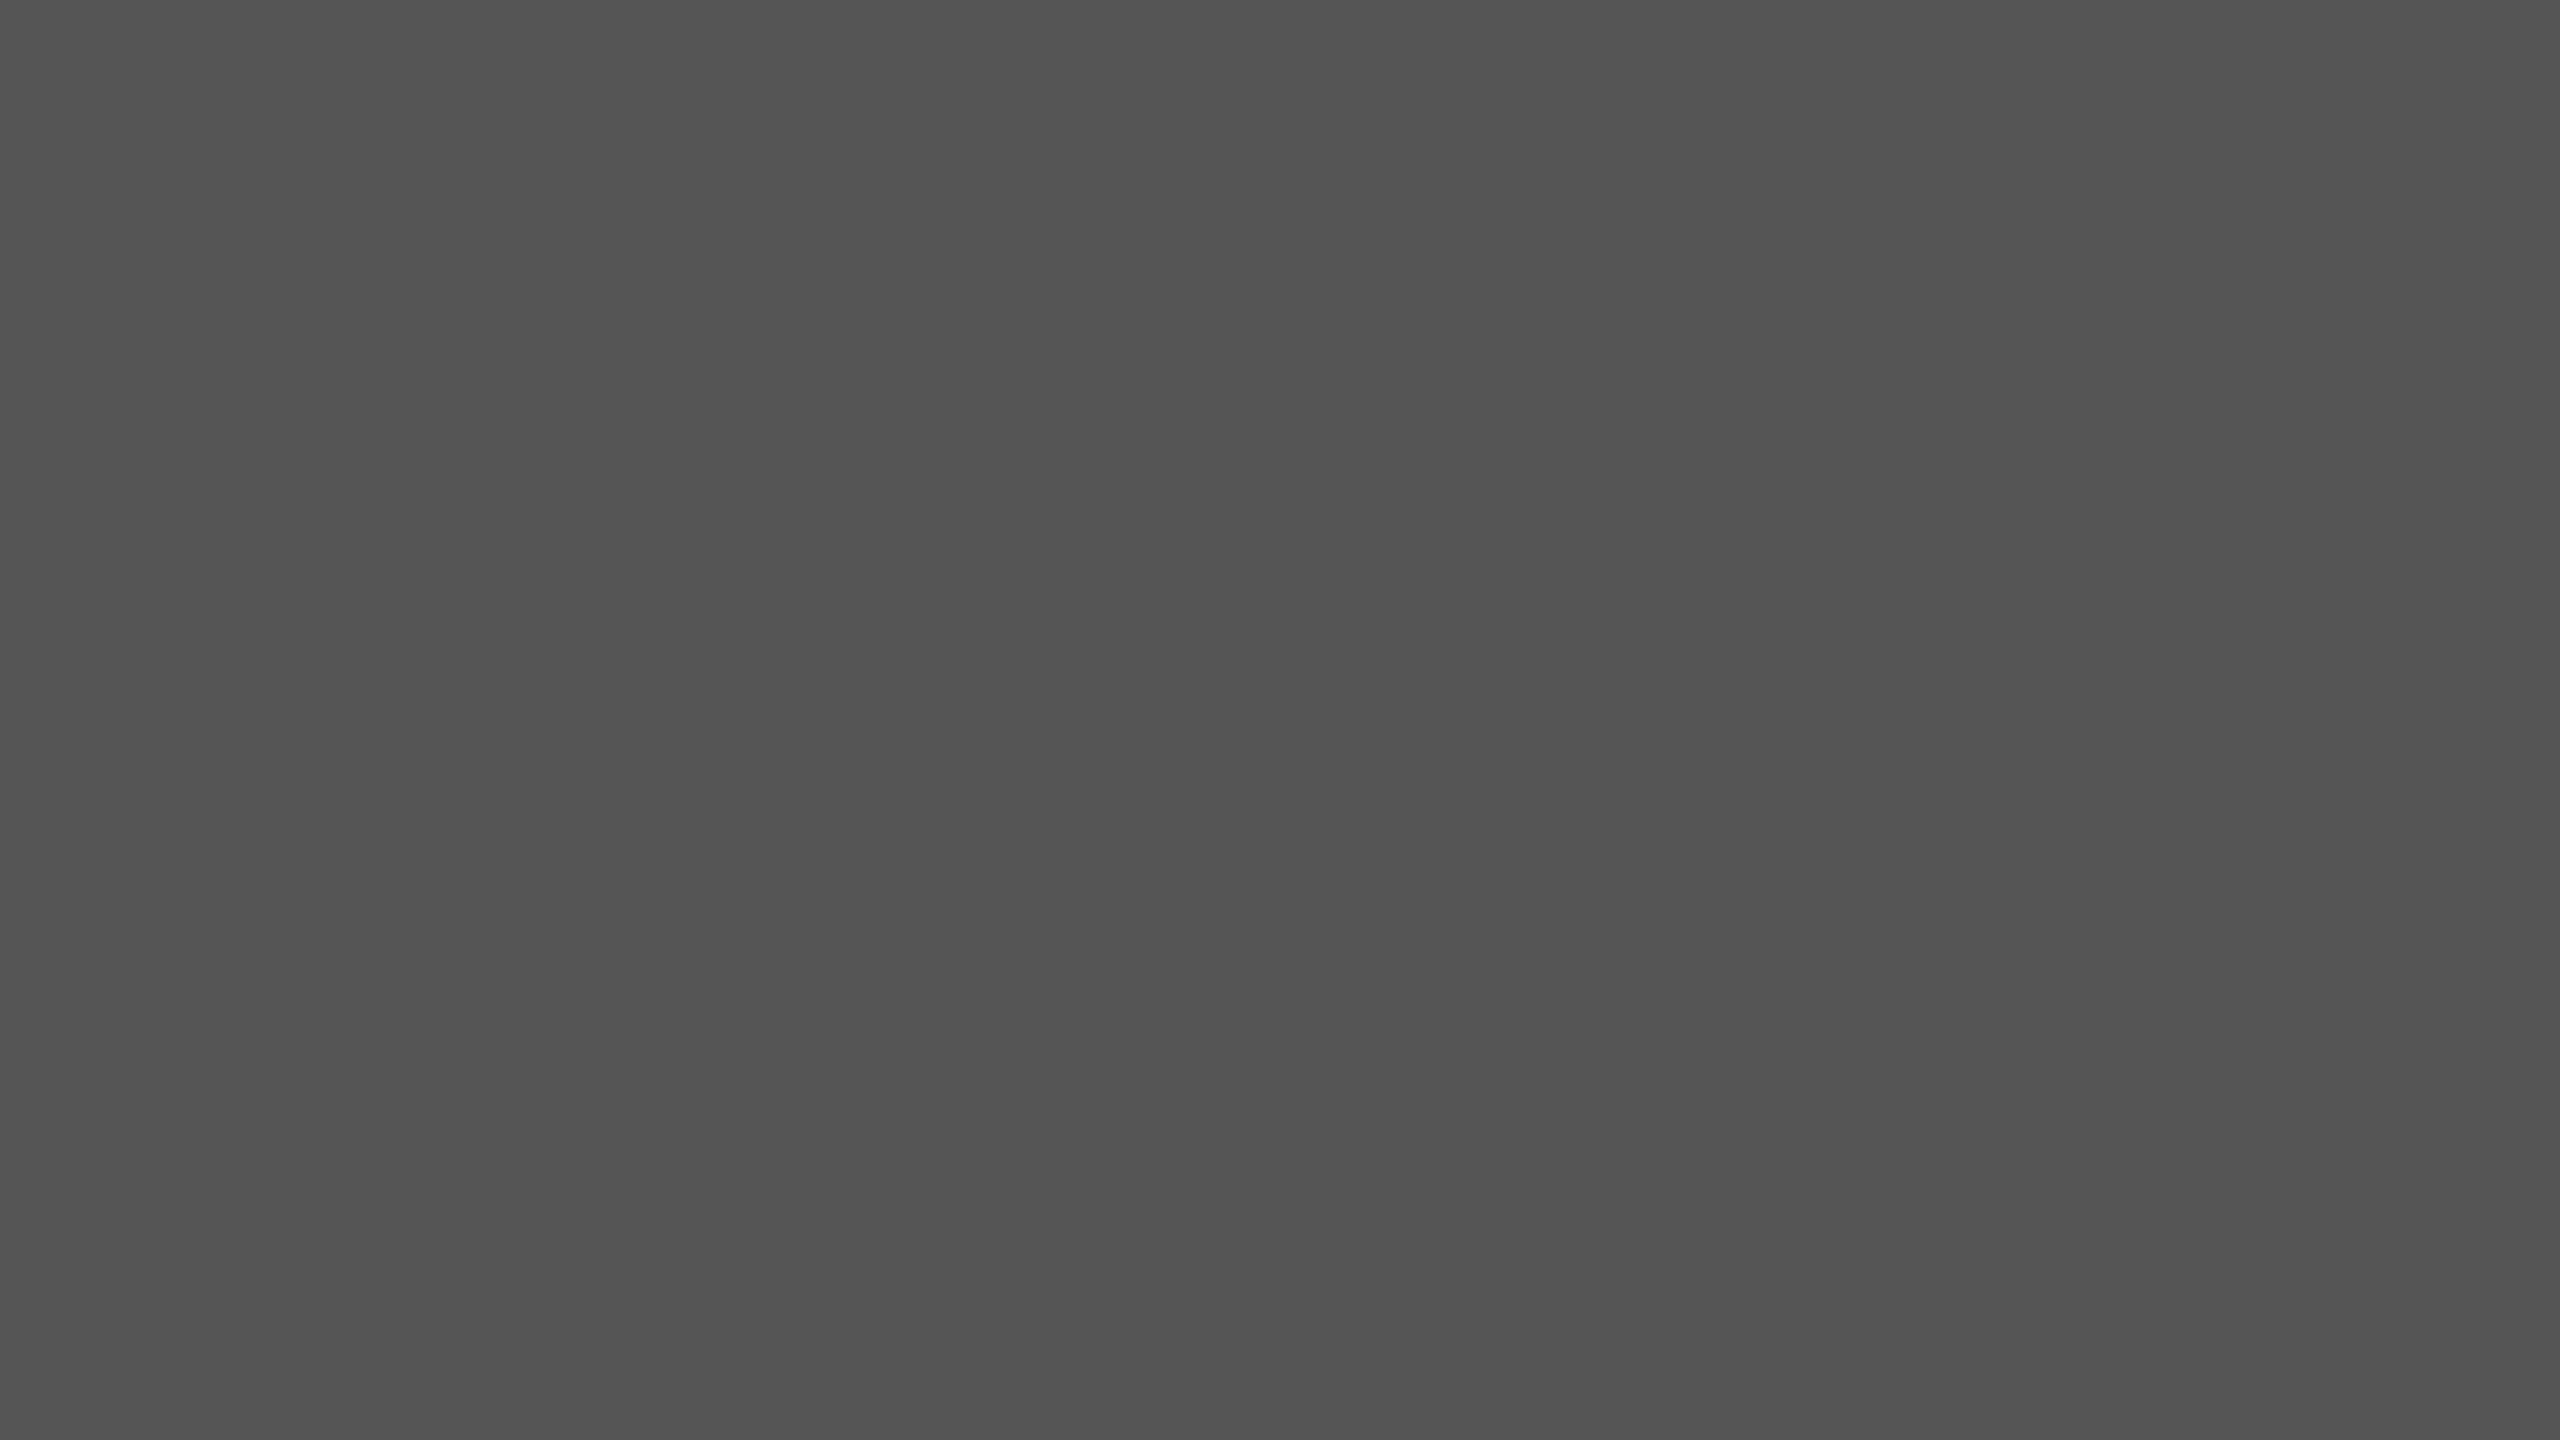 Davys Grey Solid Color Background